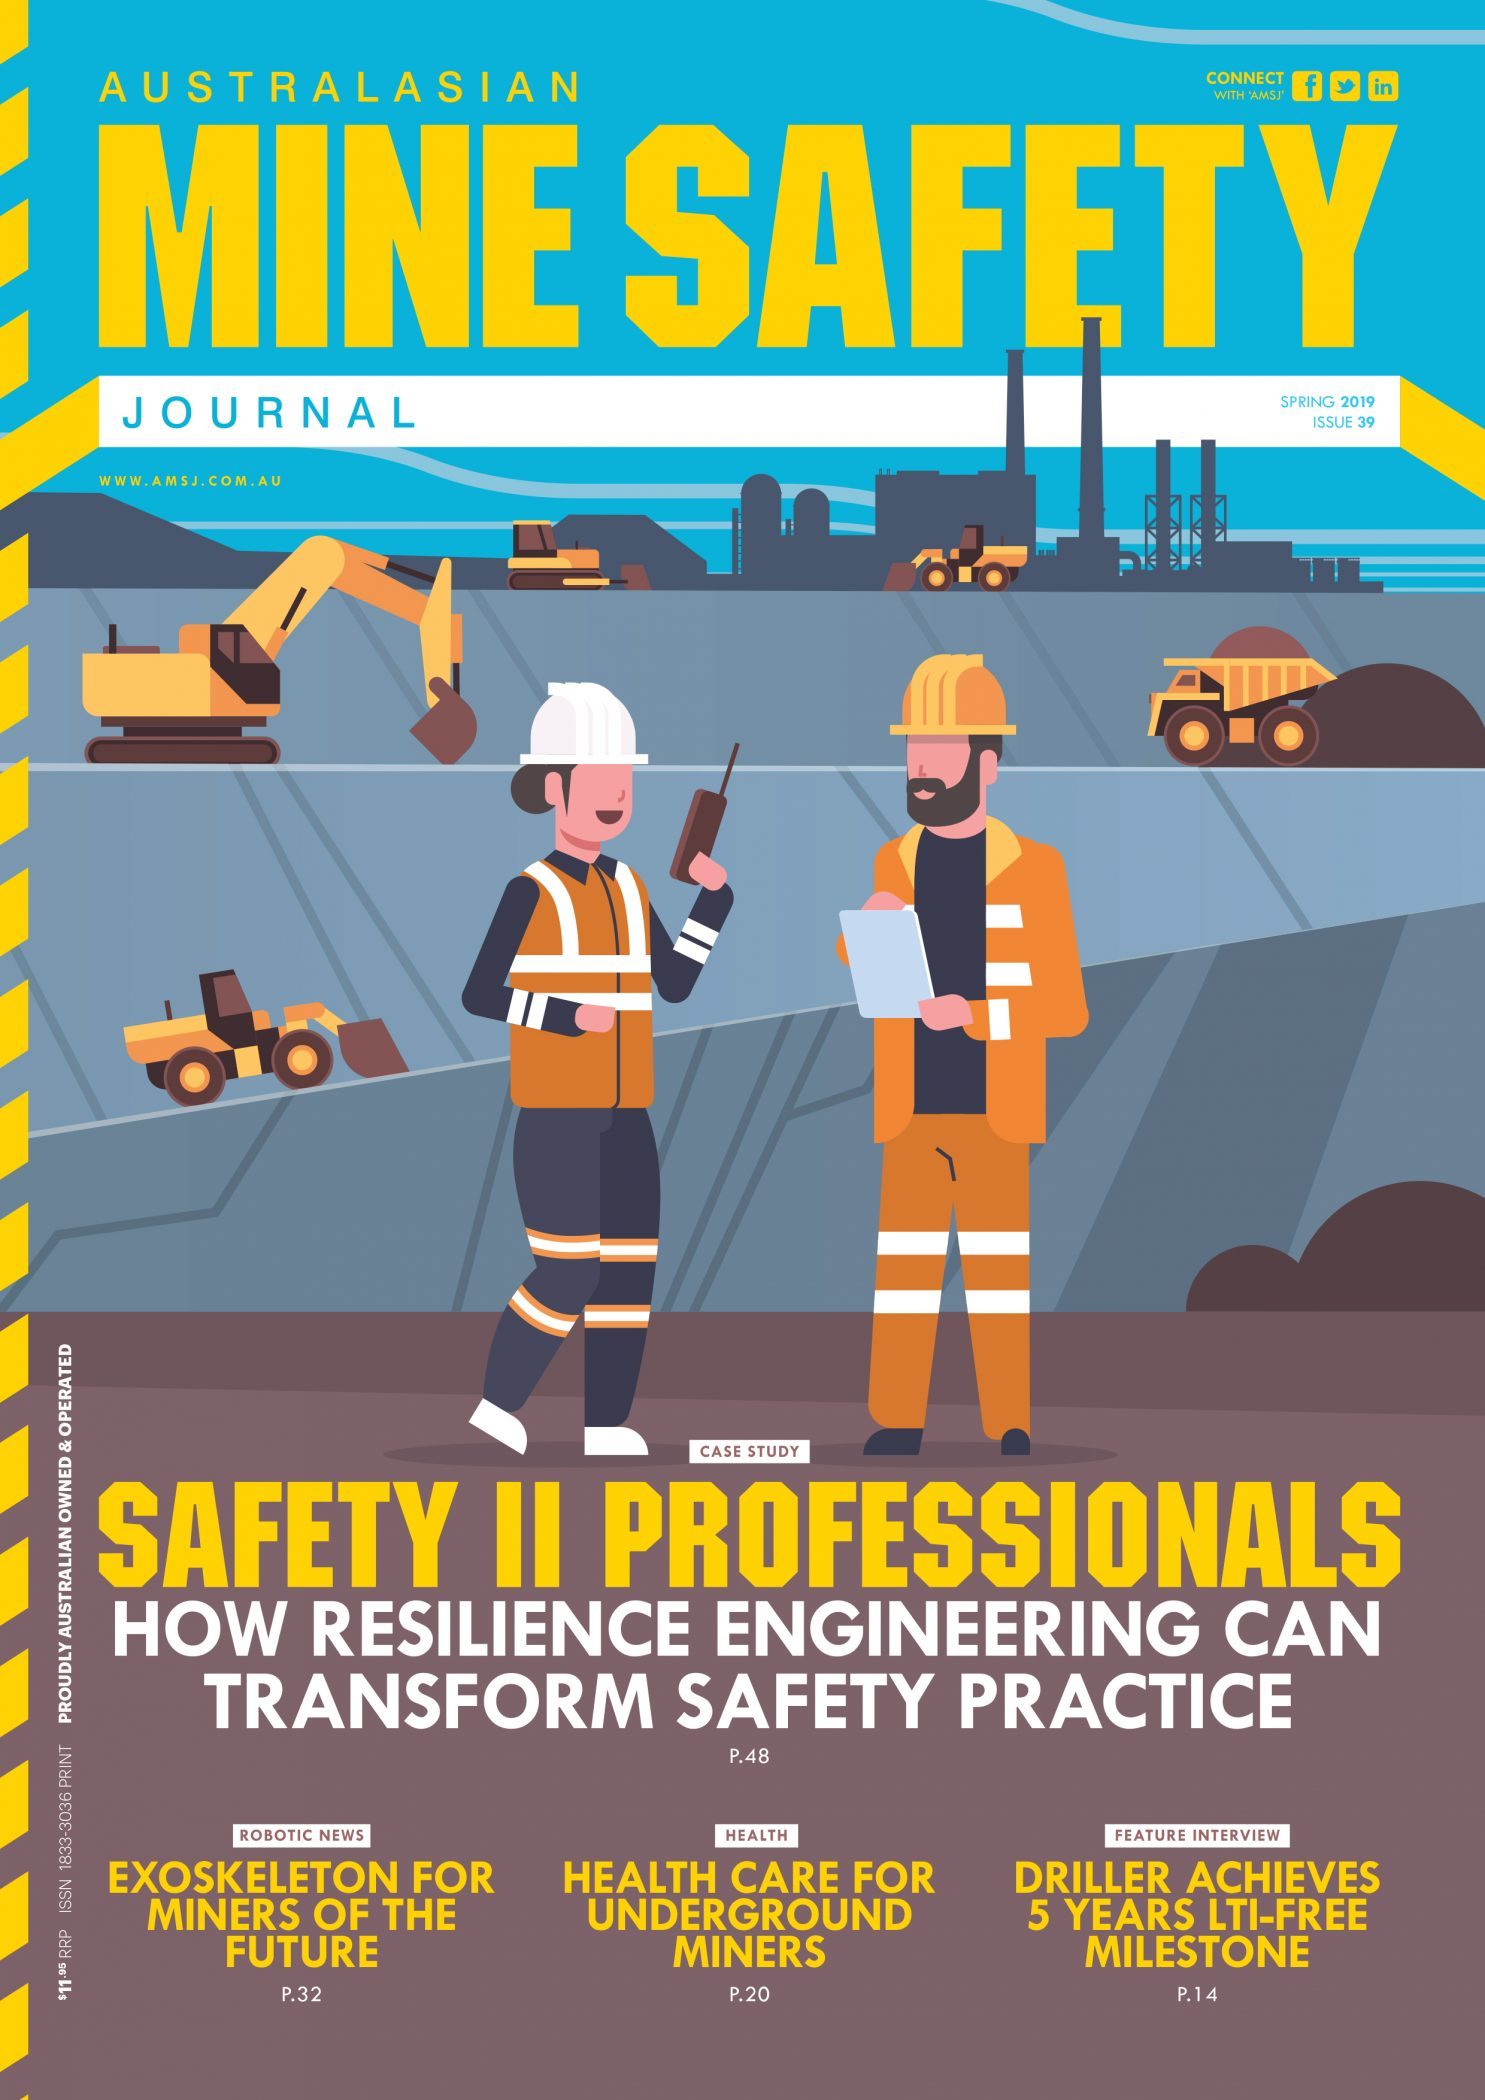 Australasian Mine Safety Journal Spring 2019